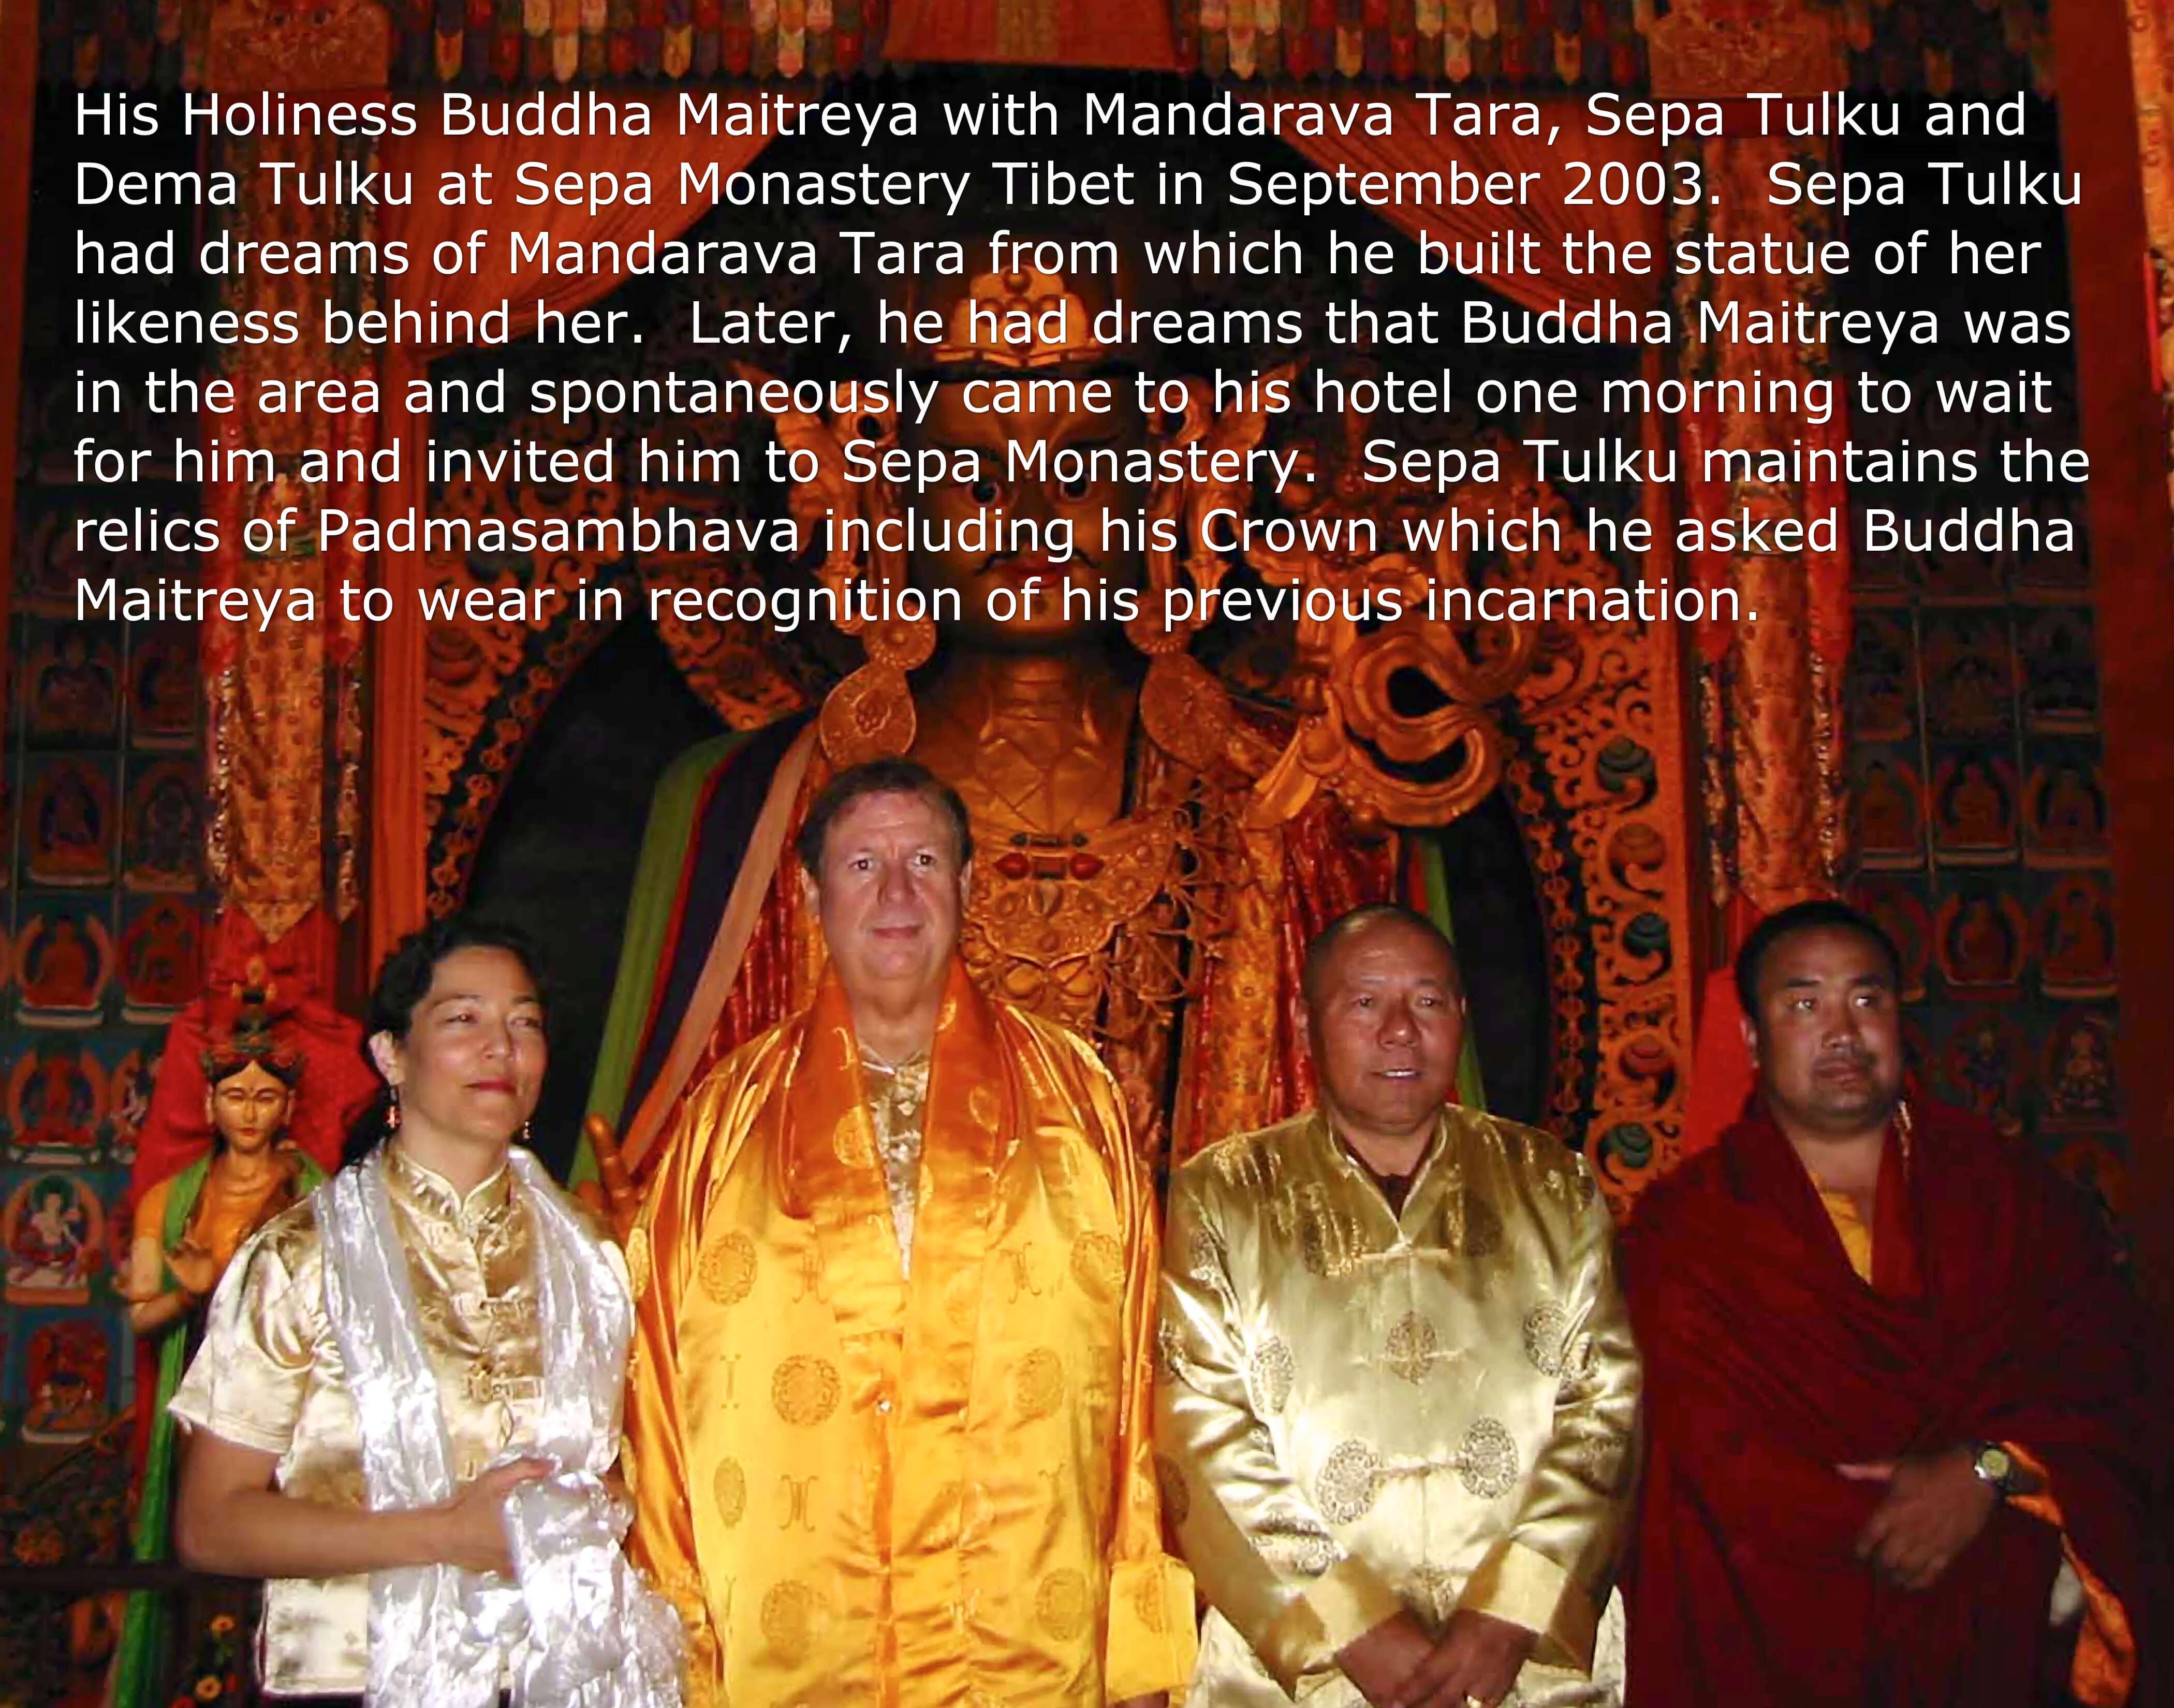 Buddha Maitreya and Mandarava Tara at Sepa Monastery